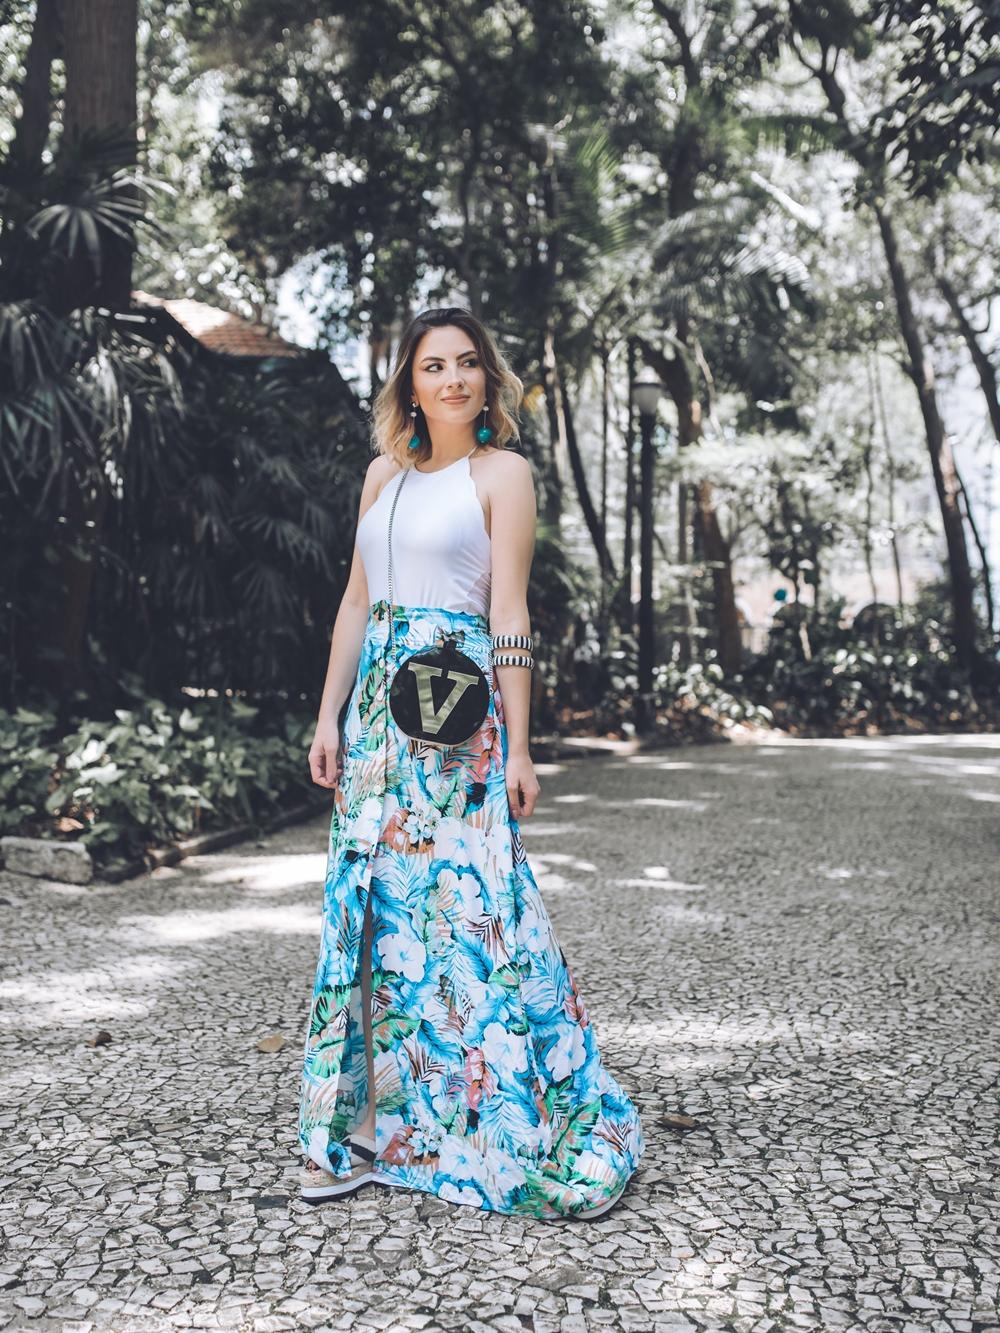 look-body-saia-longa-botoes-estampados-tendencia-verao-2016-2017-blog-vanduarte-4